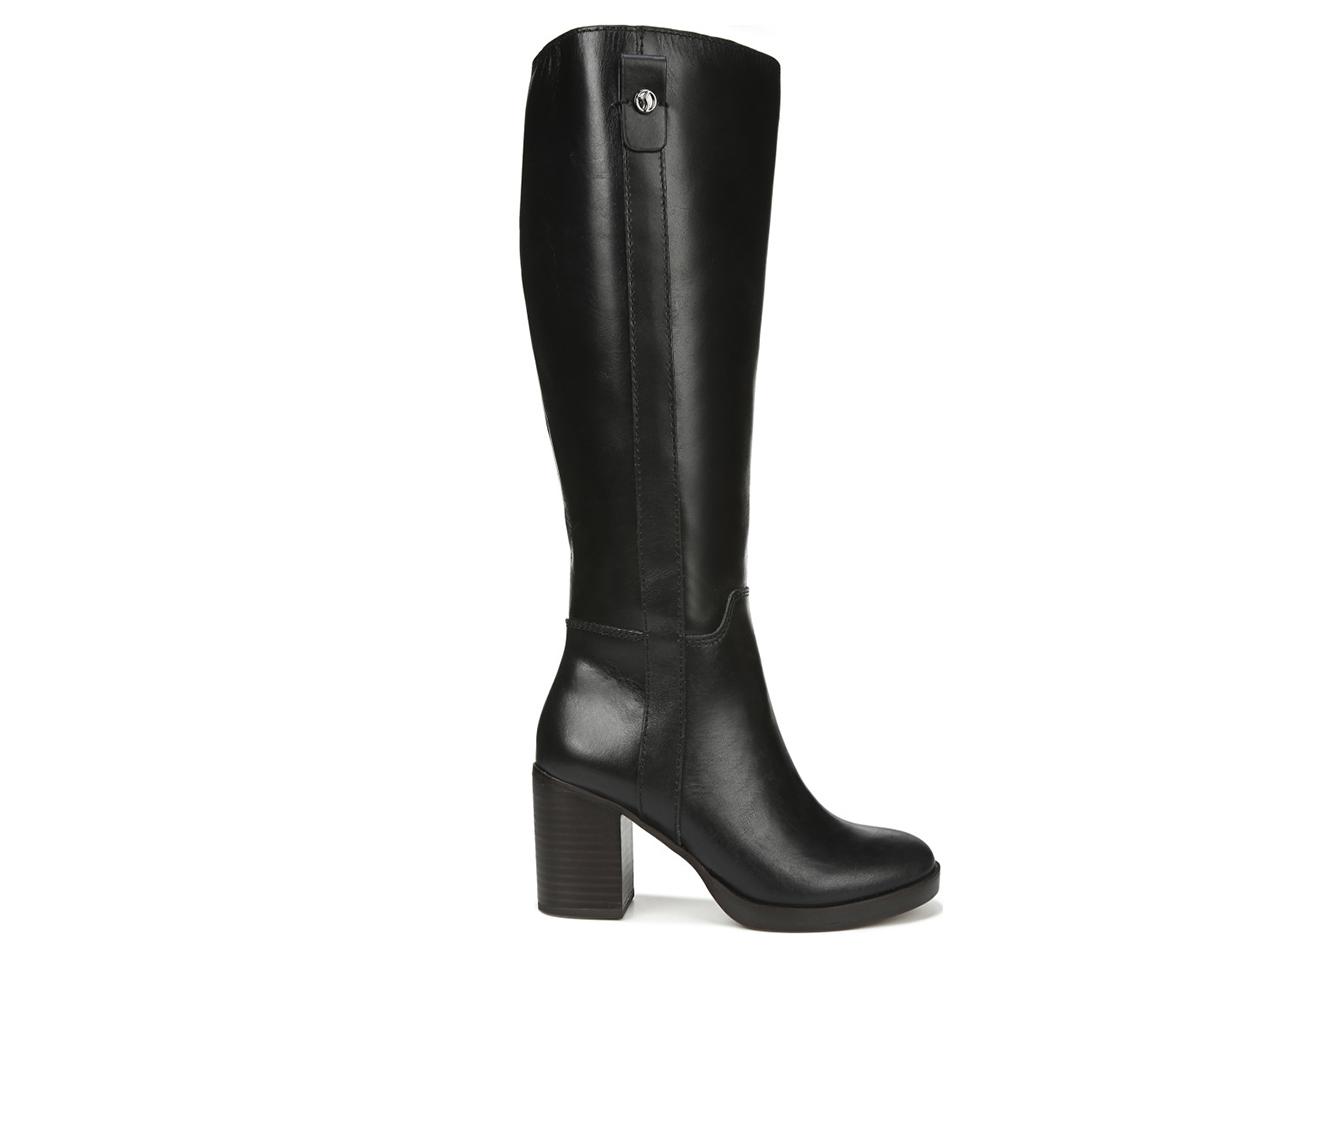 Franco Sarto Kendra Women's Boots (Black - Leather)